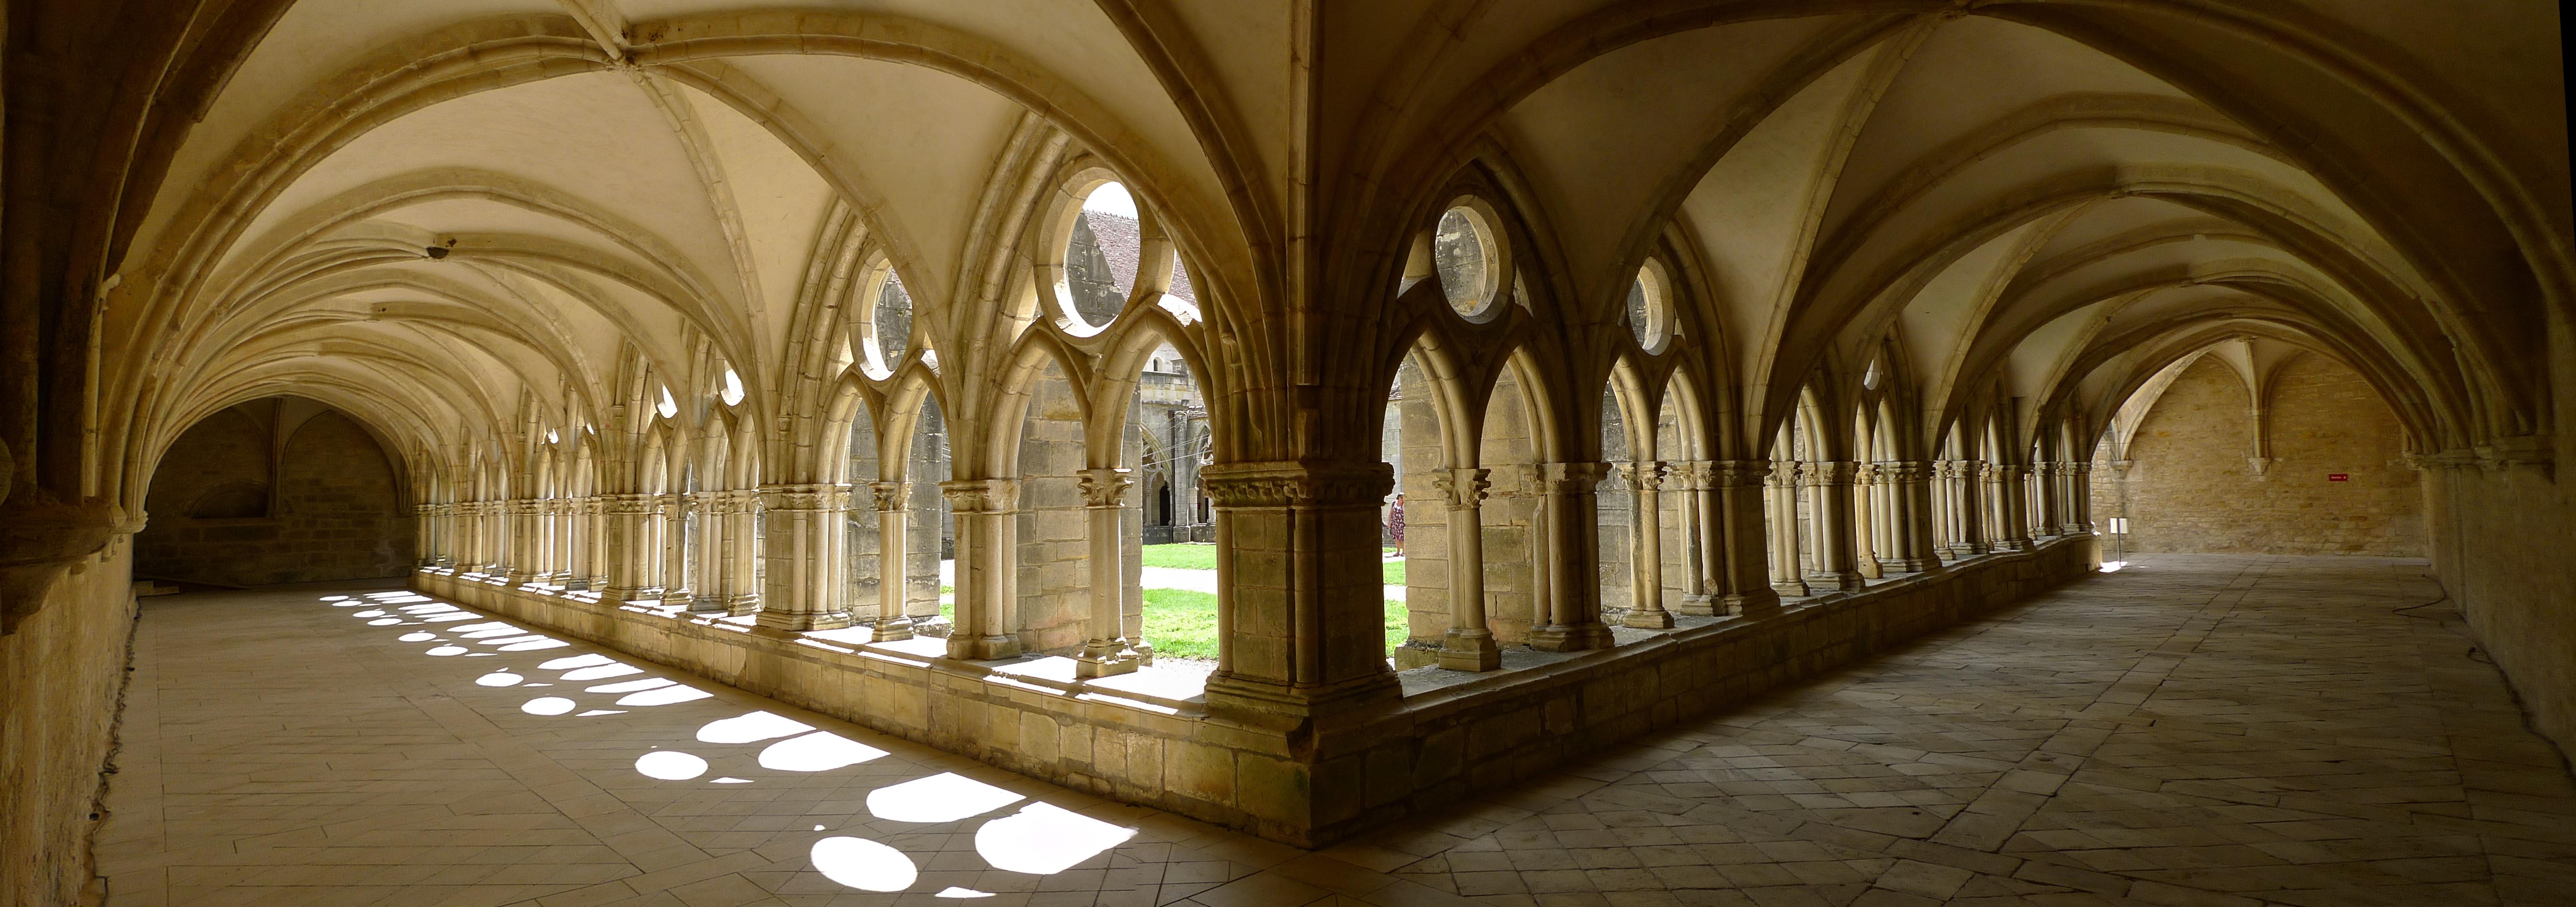 File clo tre de l 39 abbaye de wikimedia commons - Technique de la chaise ...